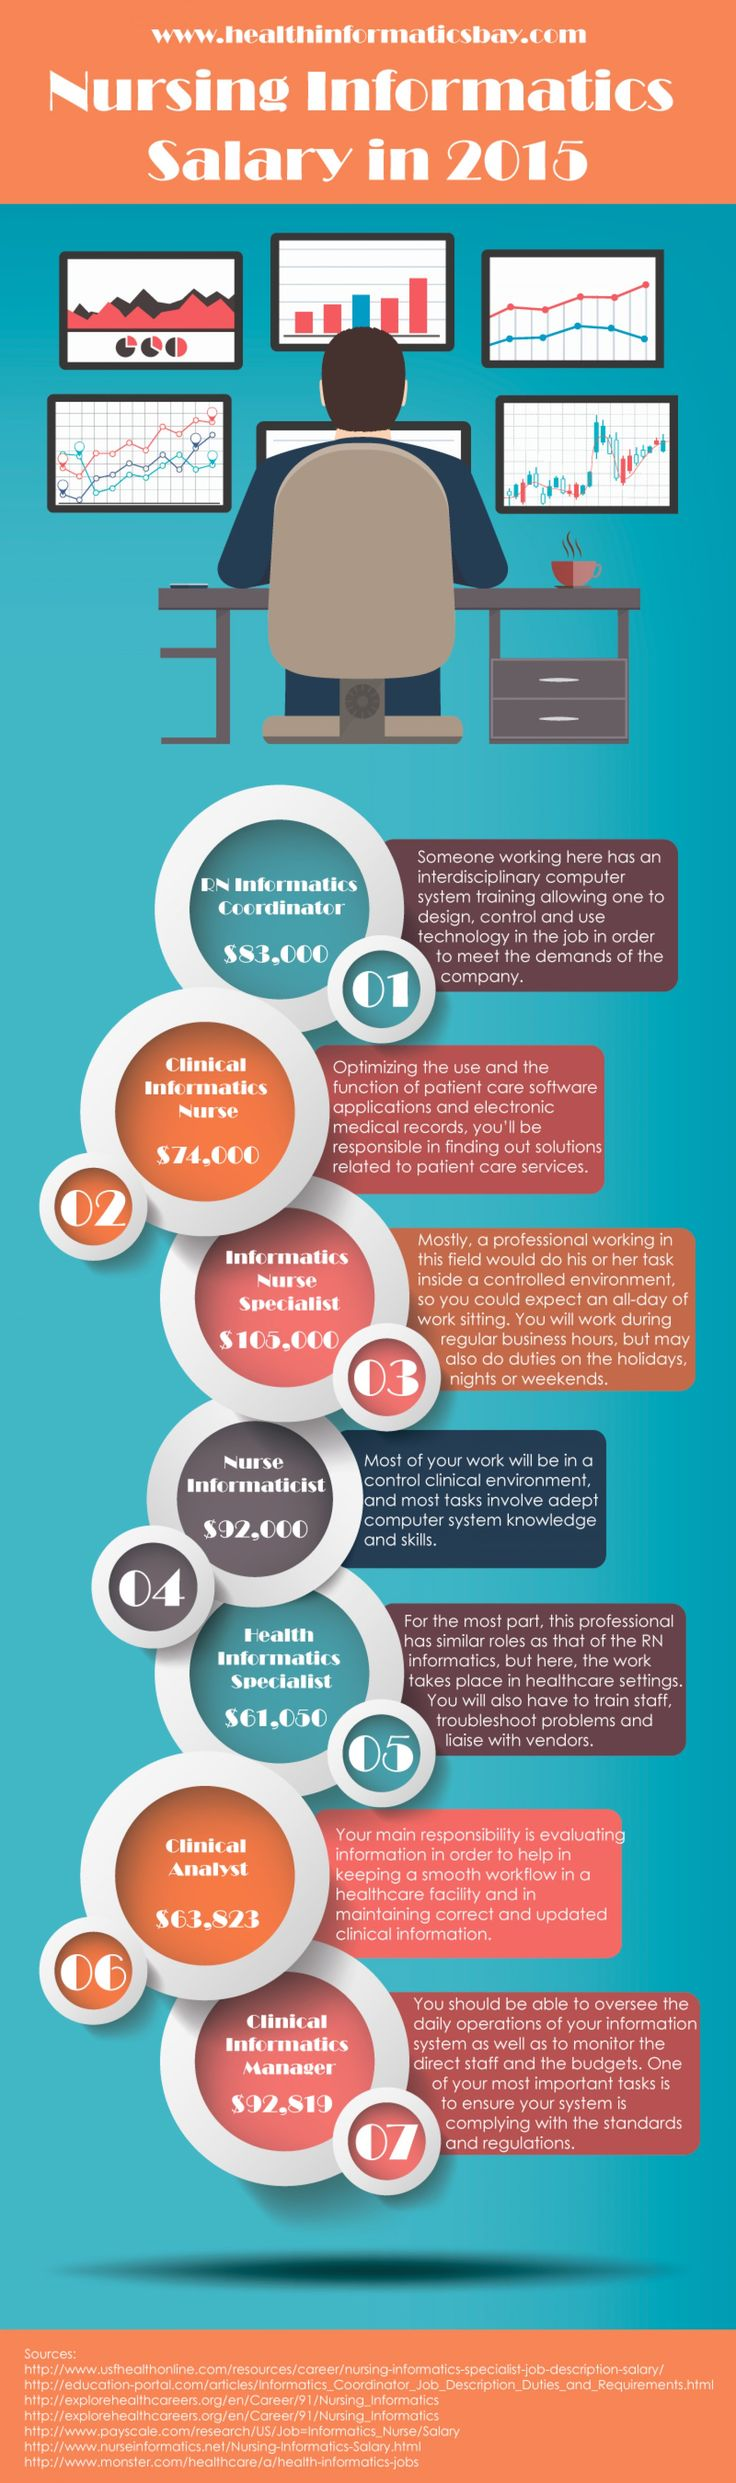 Nursing Informatics Salary in 2015 Infographic 730